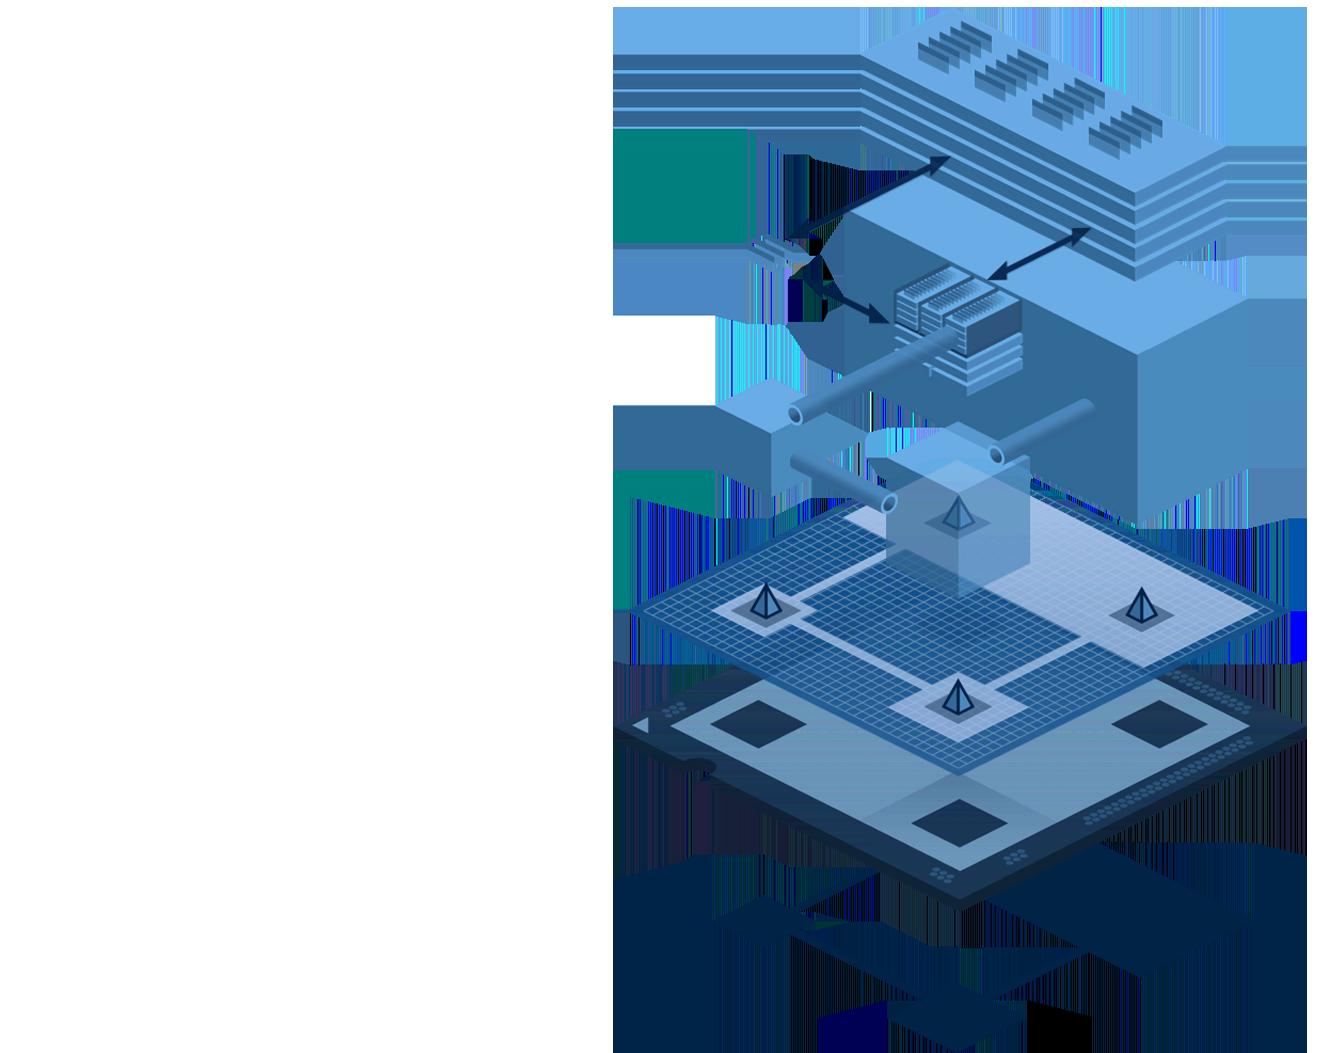 LynxMOSAic Modular Framework - Partitioned Passageways